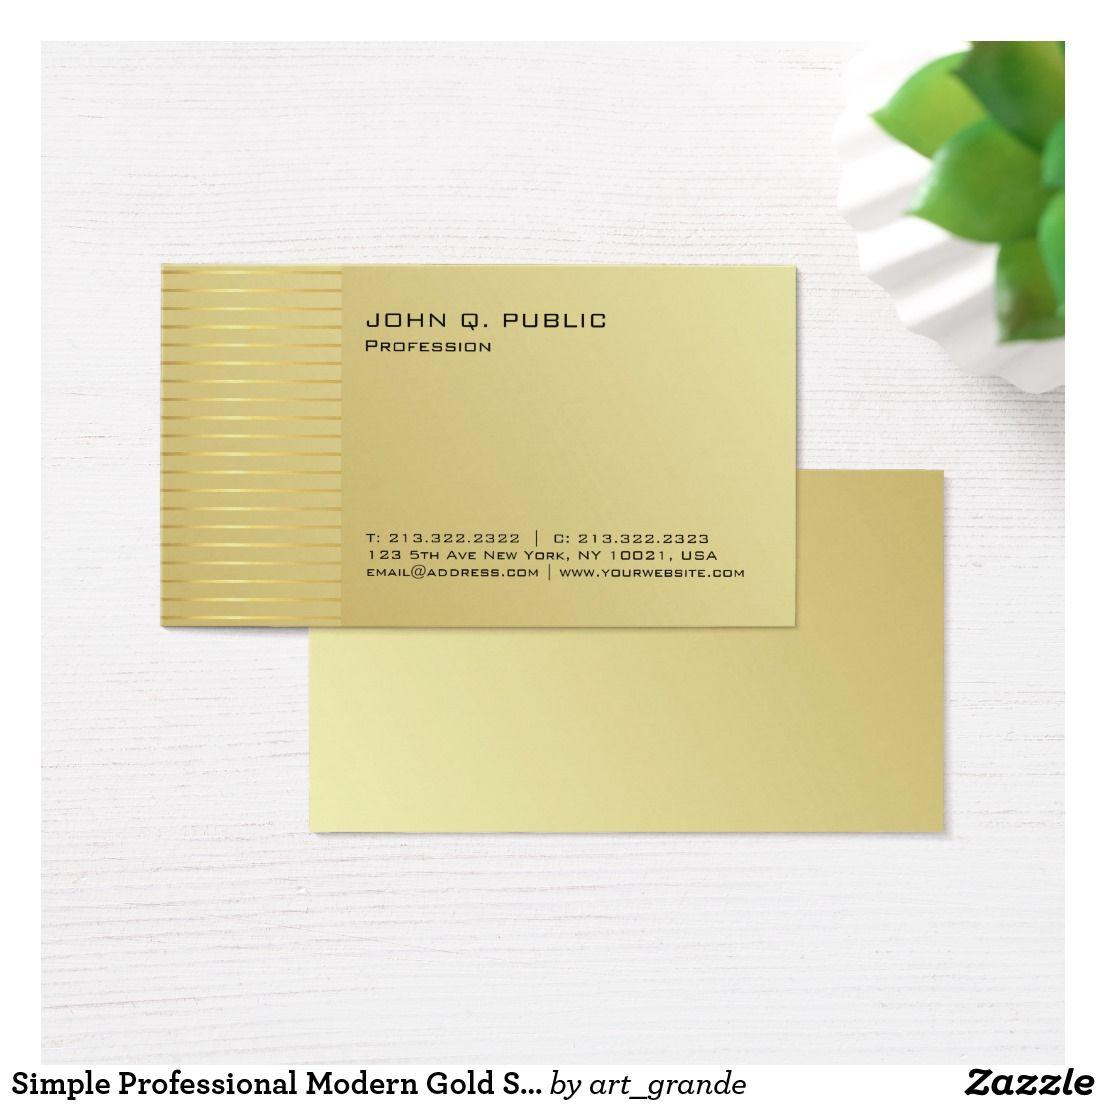 Simple Professional Modern Gold Signature Uv Matte Business